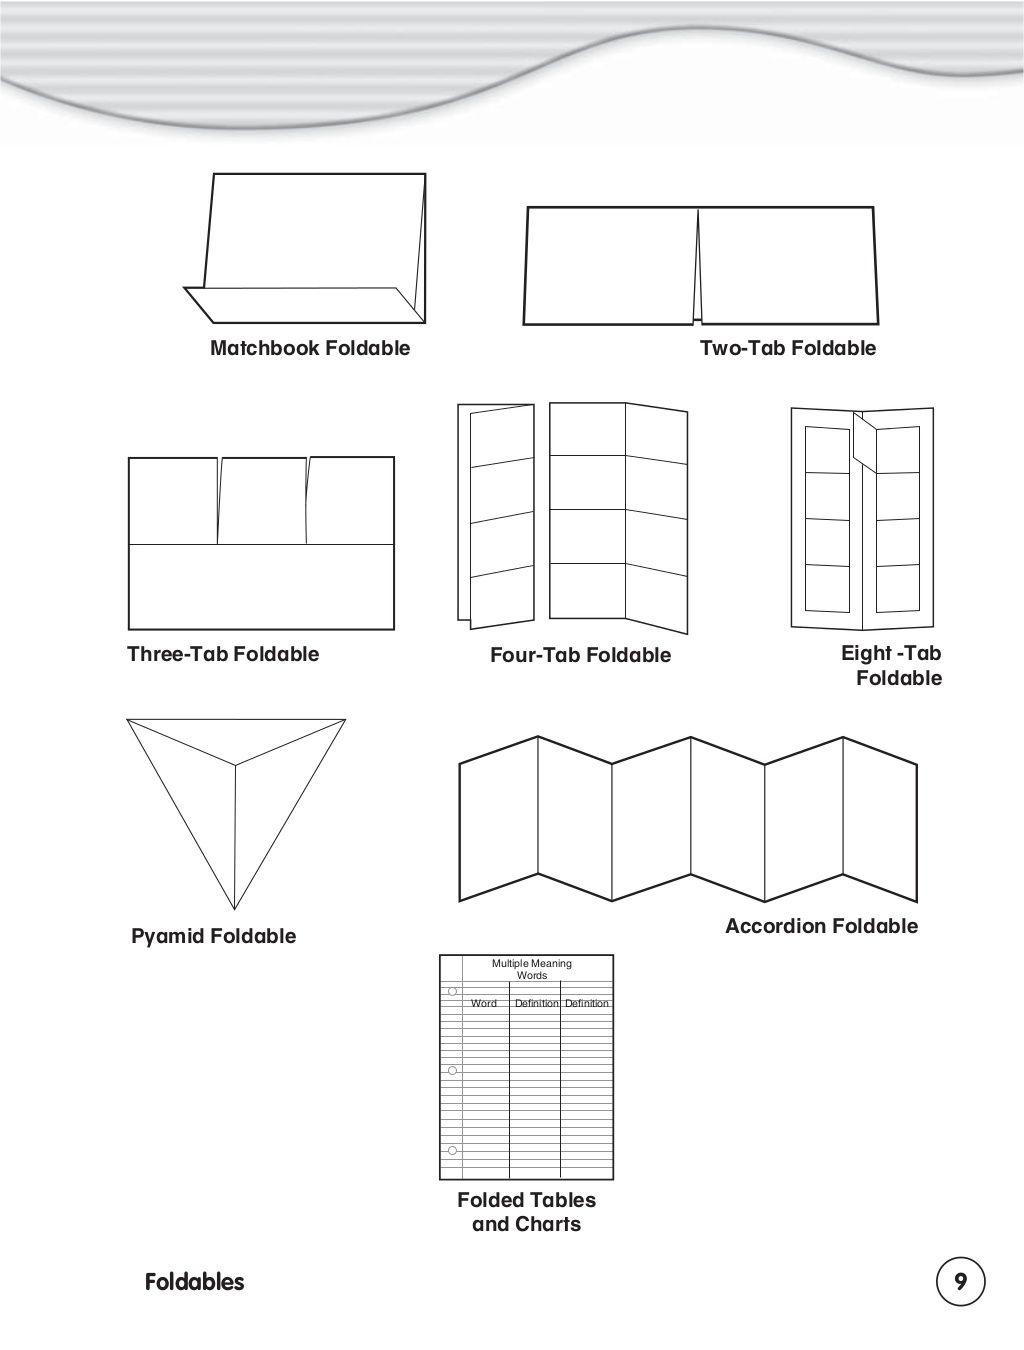 foldables pliants education interactive science notebooks